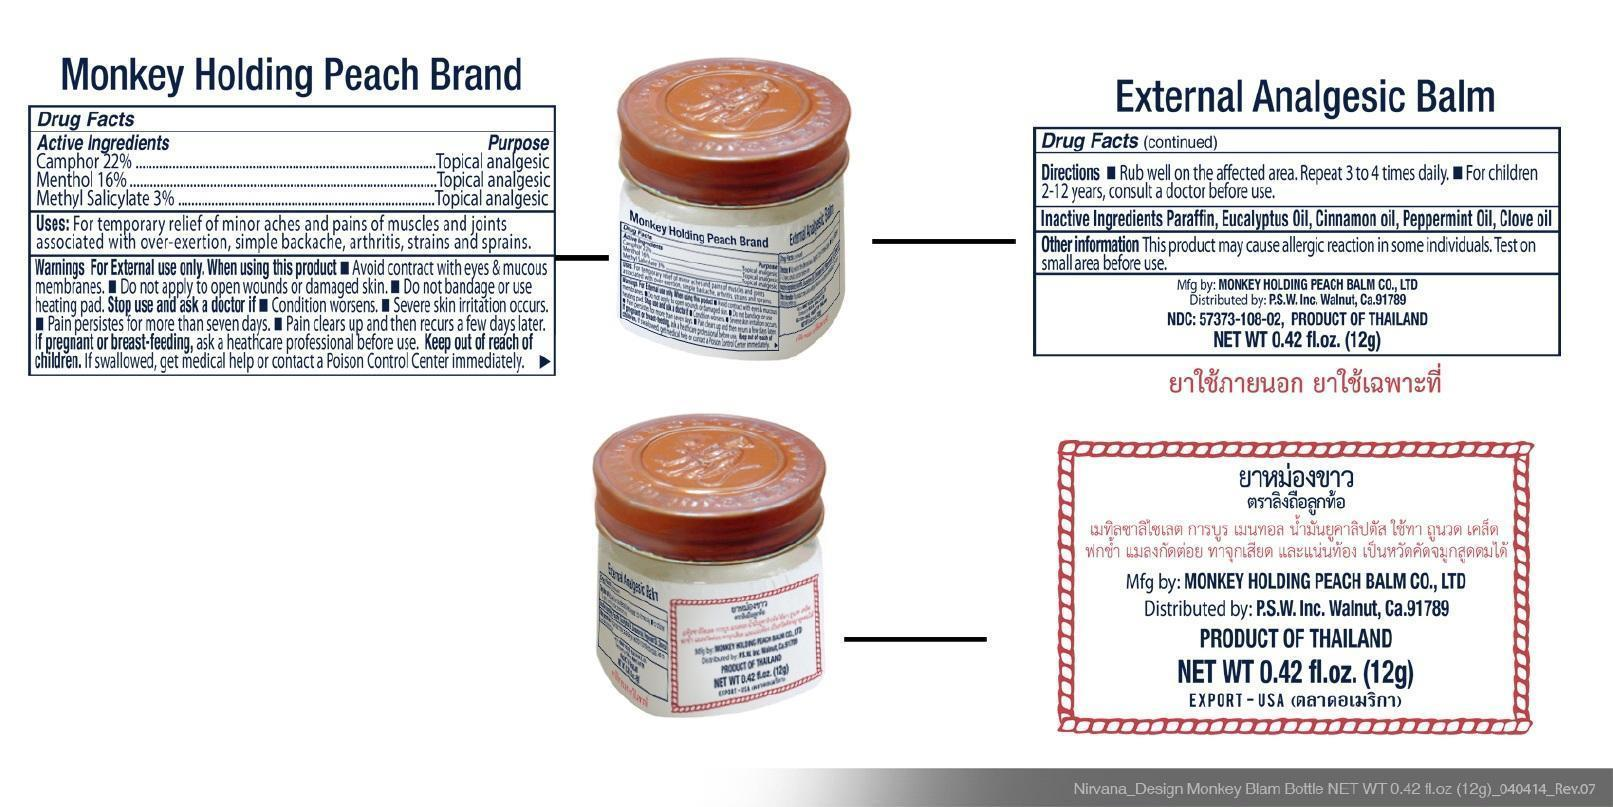 Monkey Holding Peach Brand External Analgesic Balm (Camphor,menthol,methyl Salicylate) Ointment [P.s.w. Inc.]